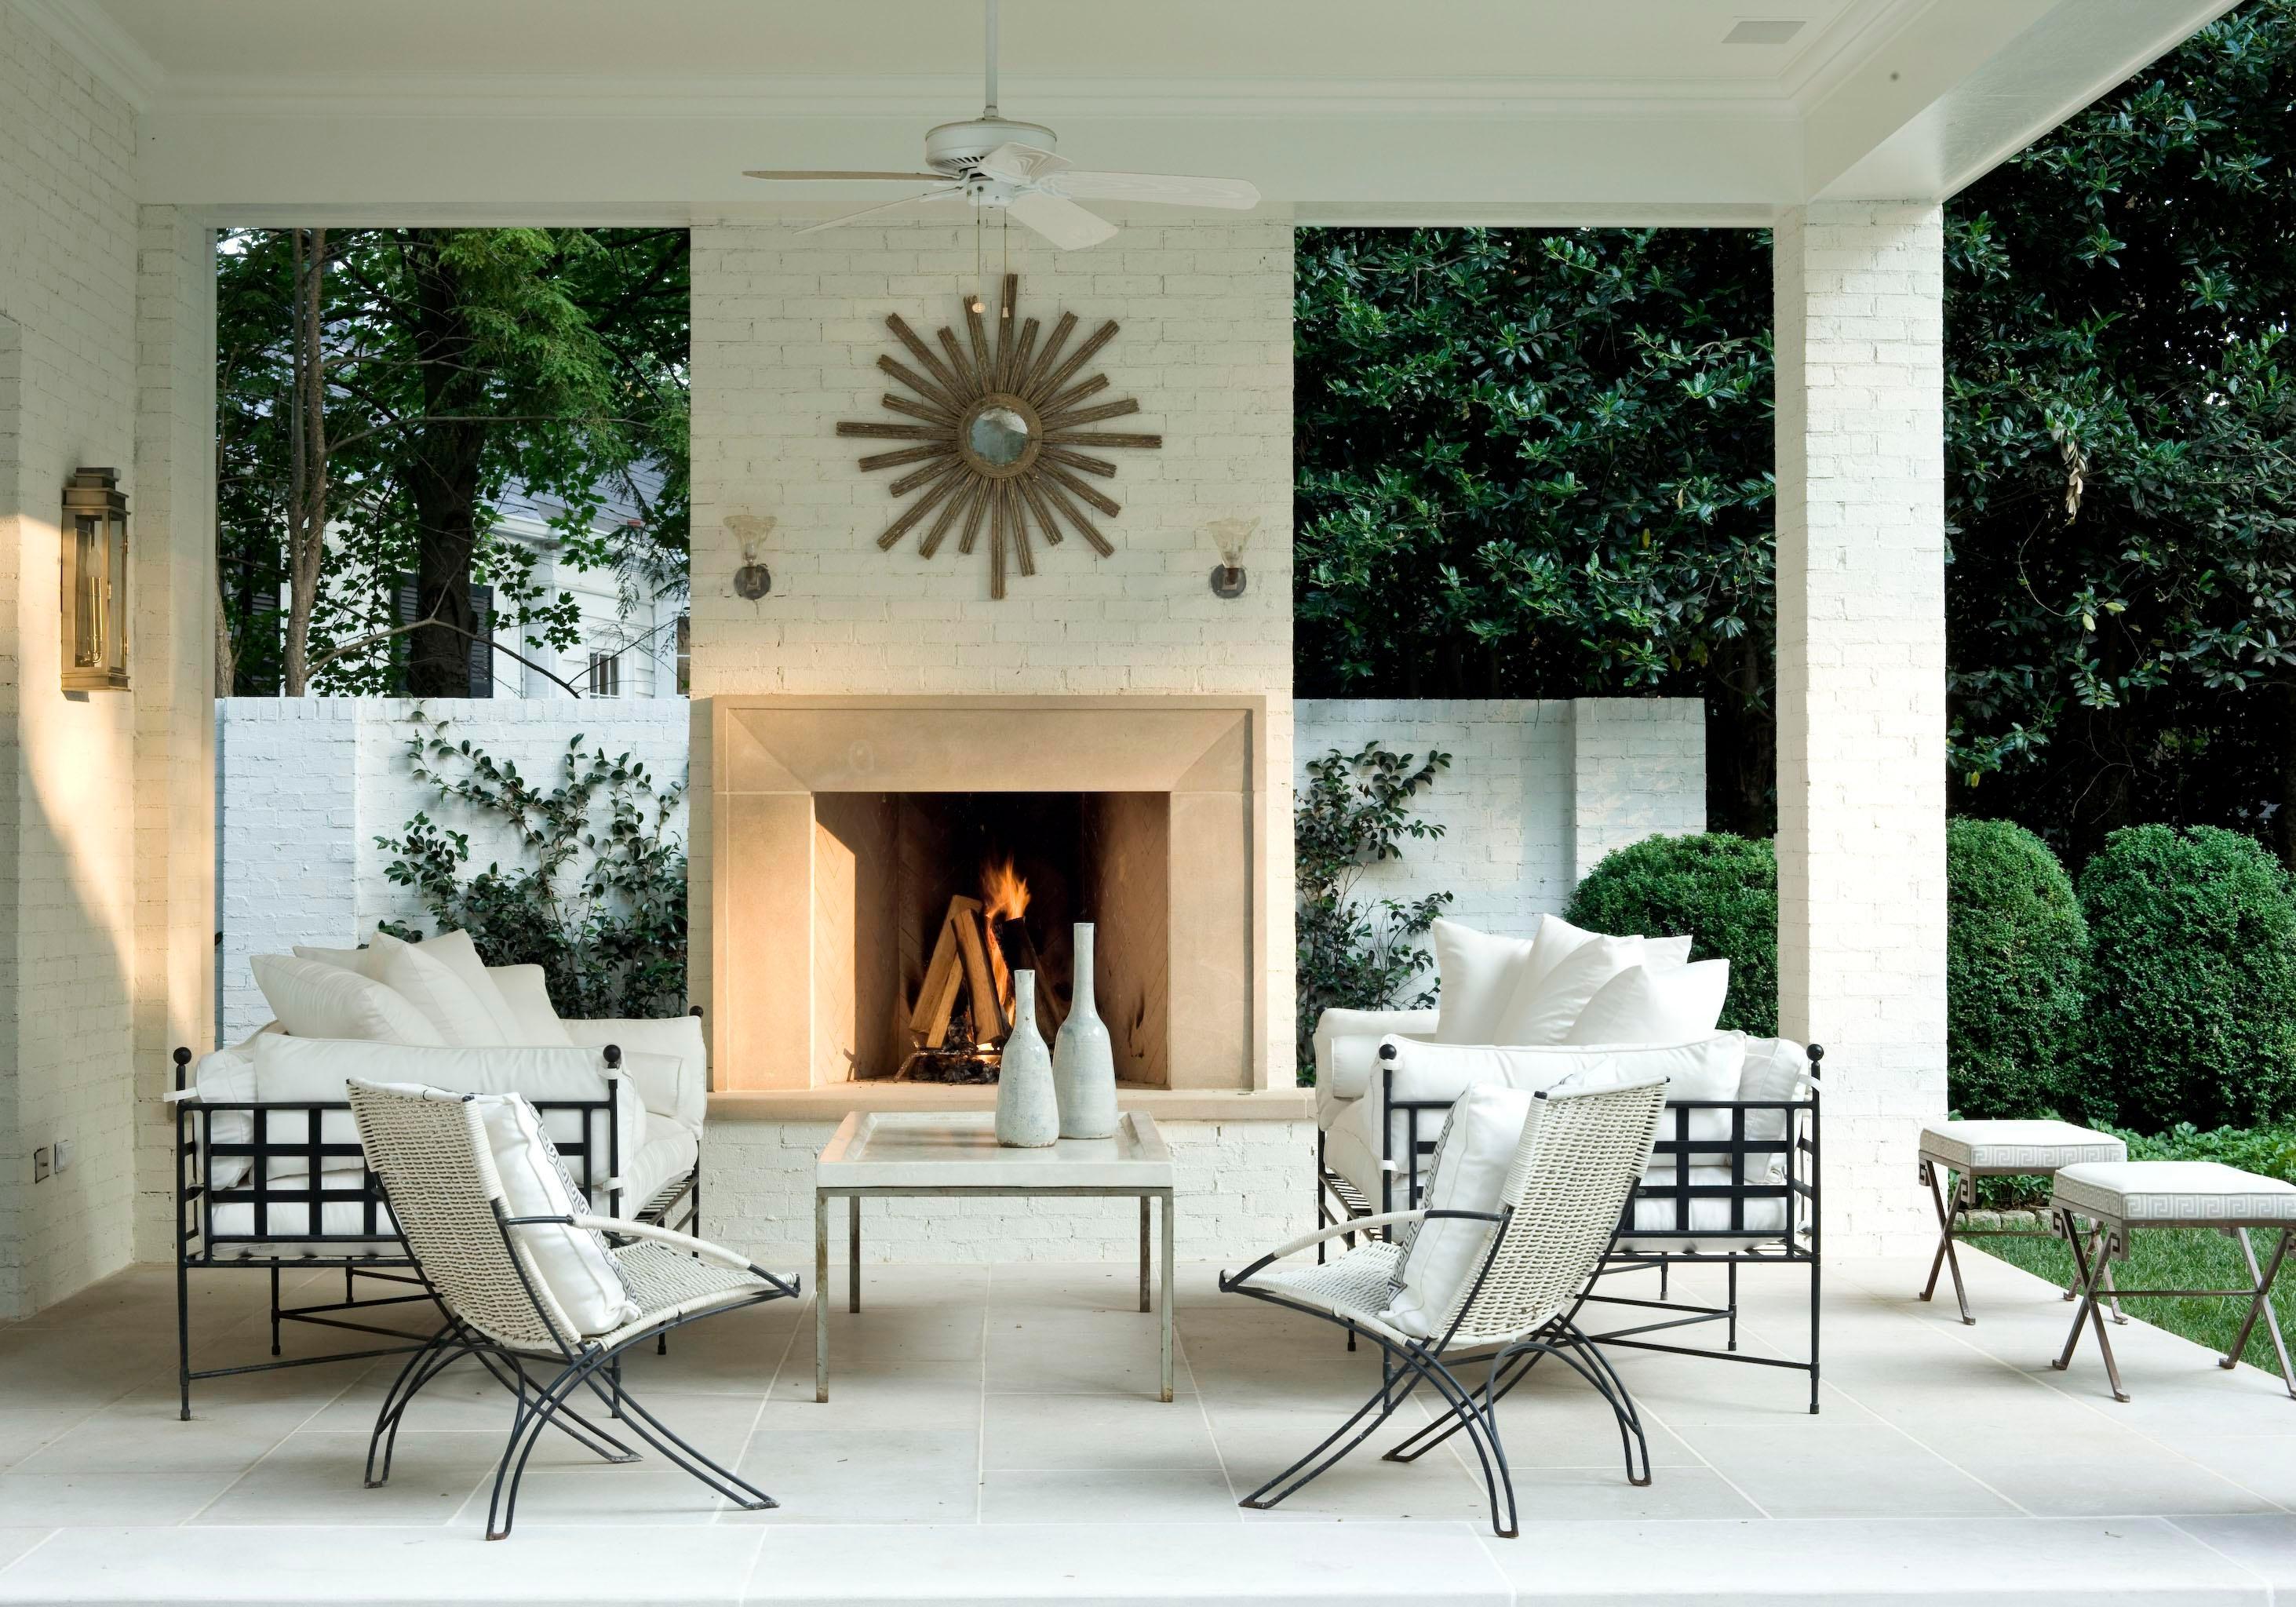 Superbe Suzanne.kasler.interiors.portfolio.exteriors.1494533103.356744